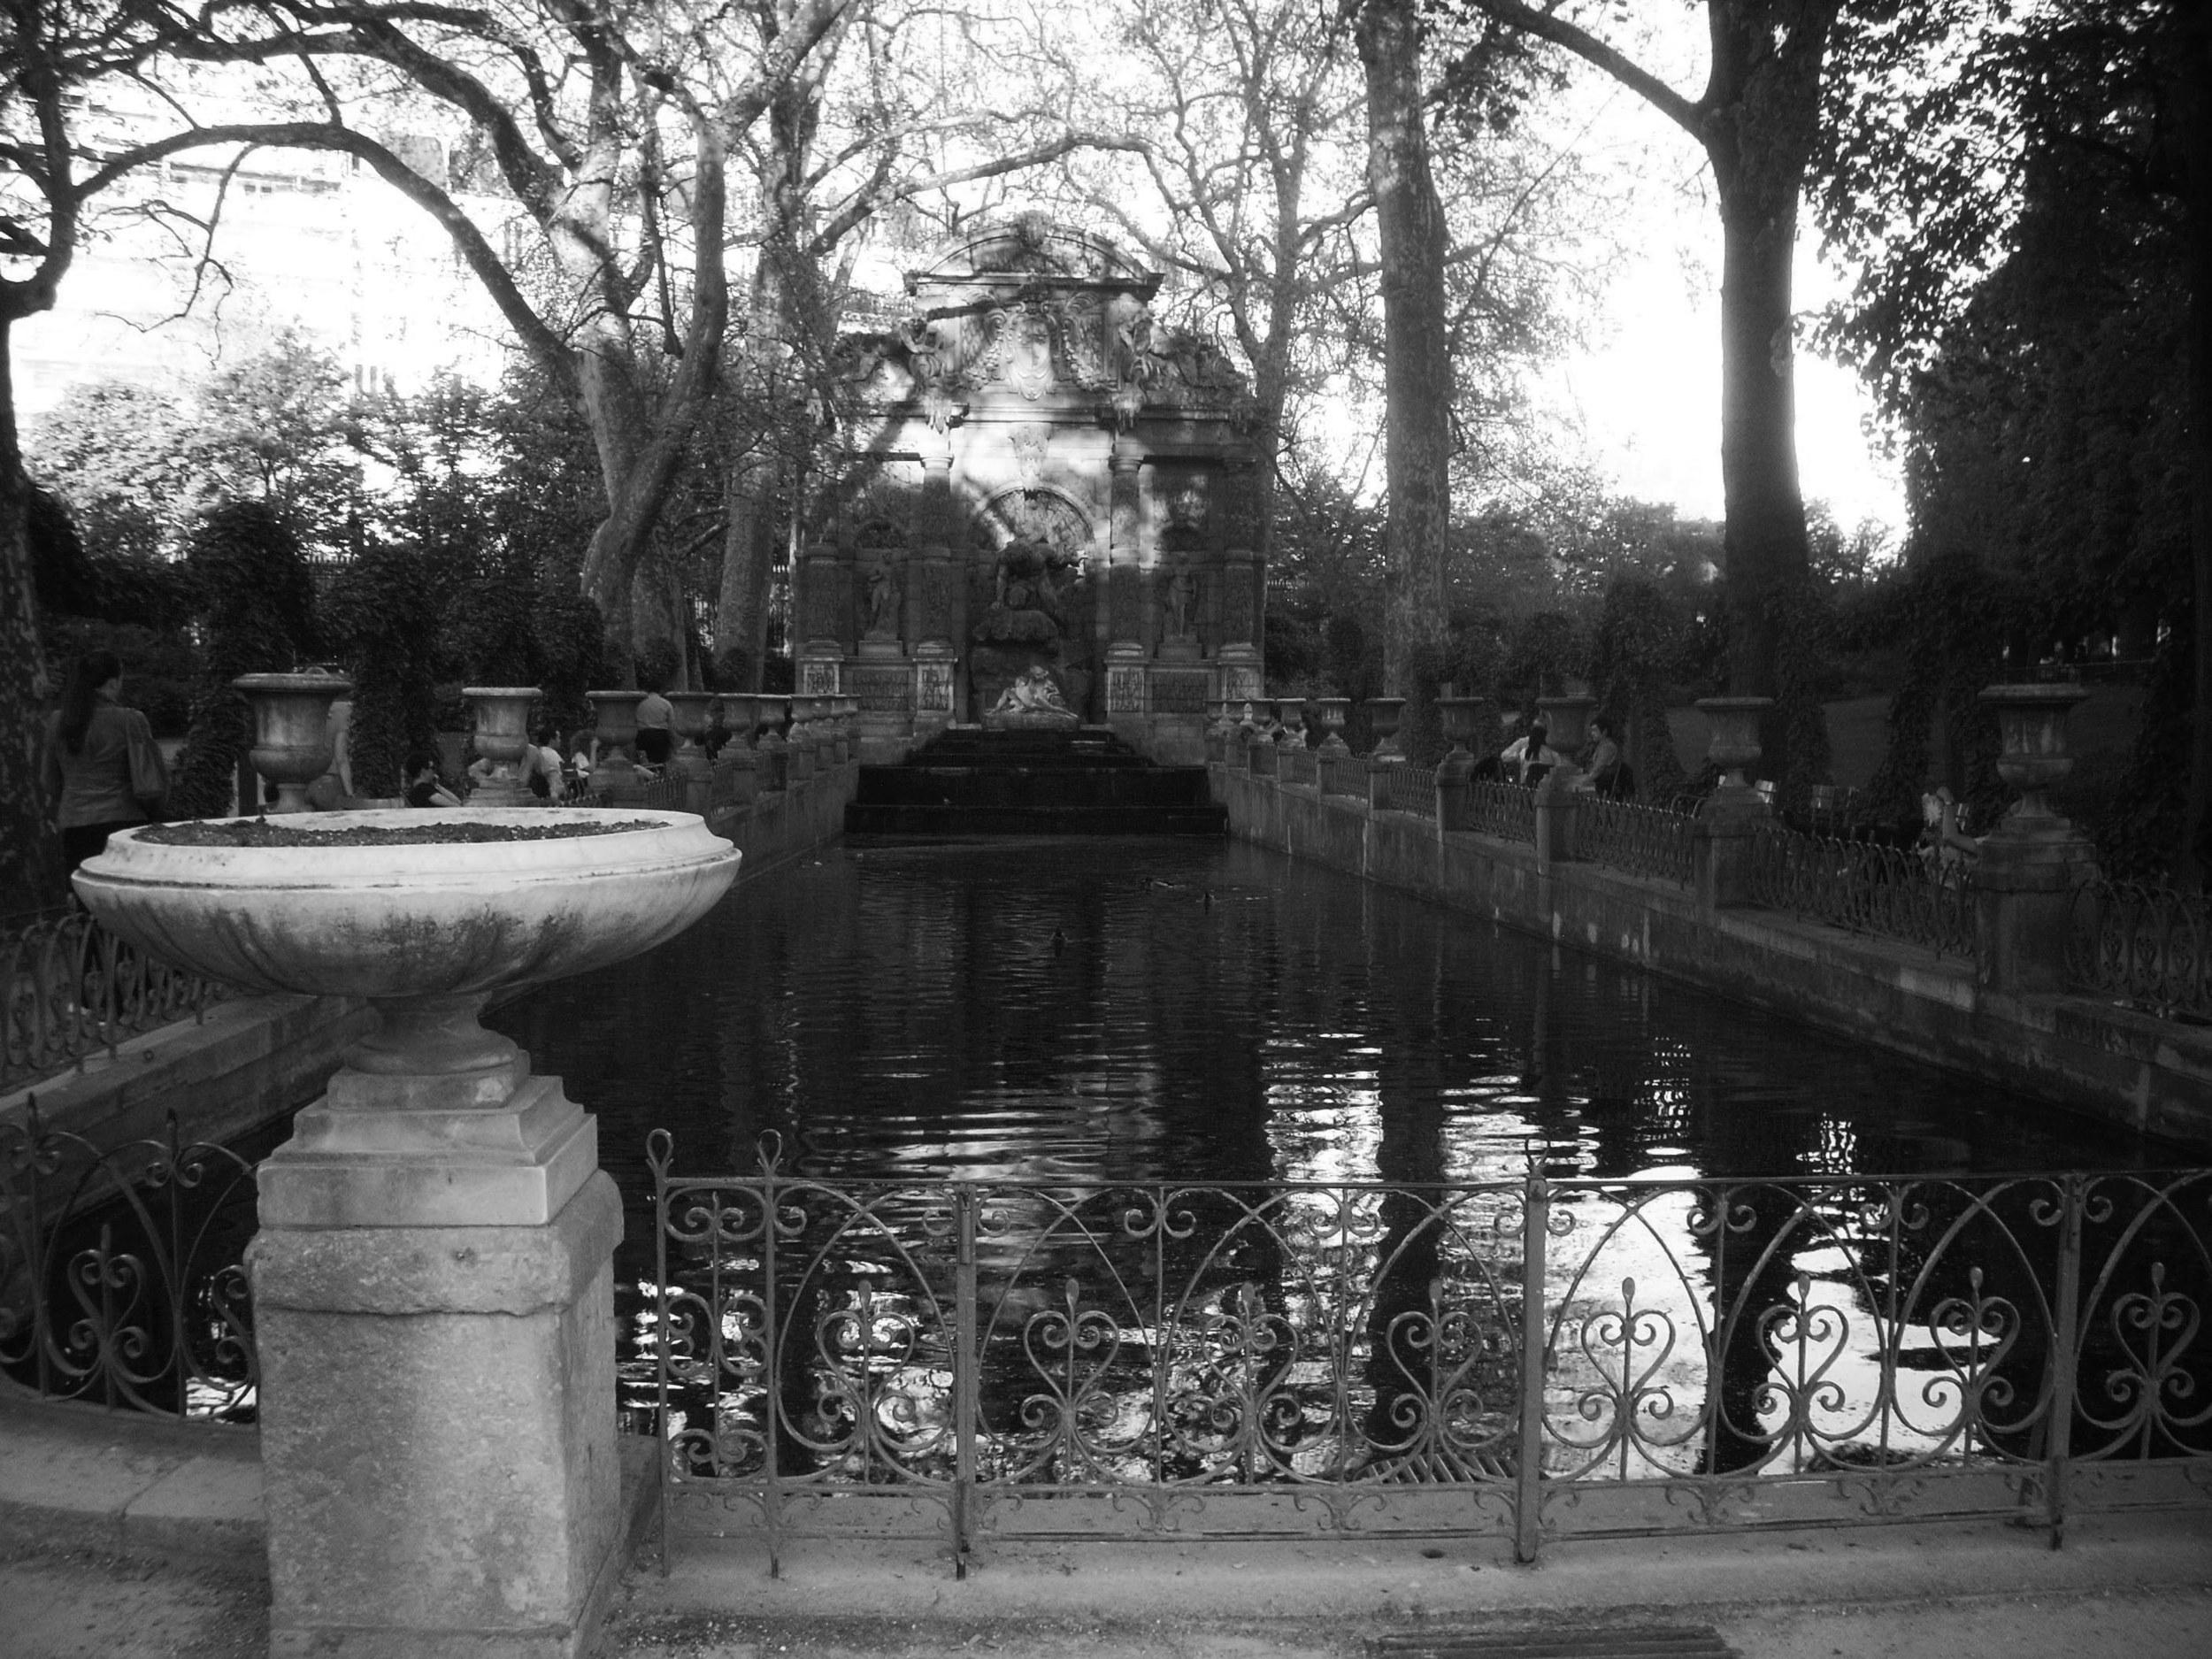 b & w luxembourg gardens.jpg